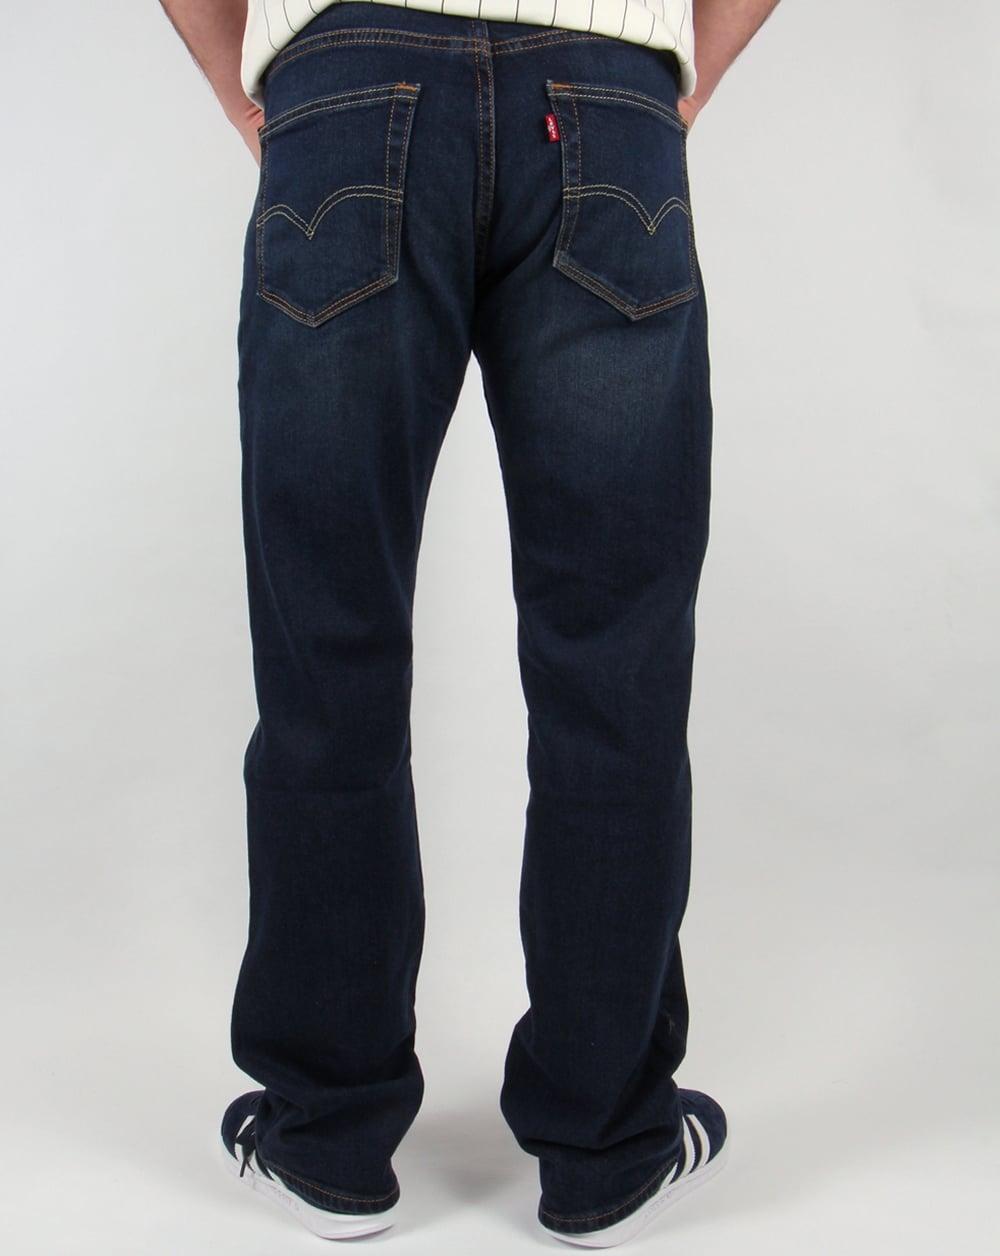 levis 527 boot cut jeans california dark wash levi 39 s from 80s casual classics uk. Black Bedroom Furniture Sets. Home Design Ideas